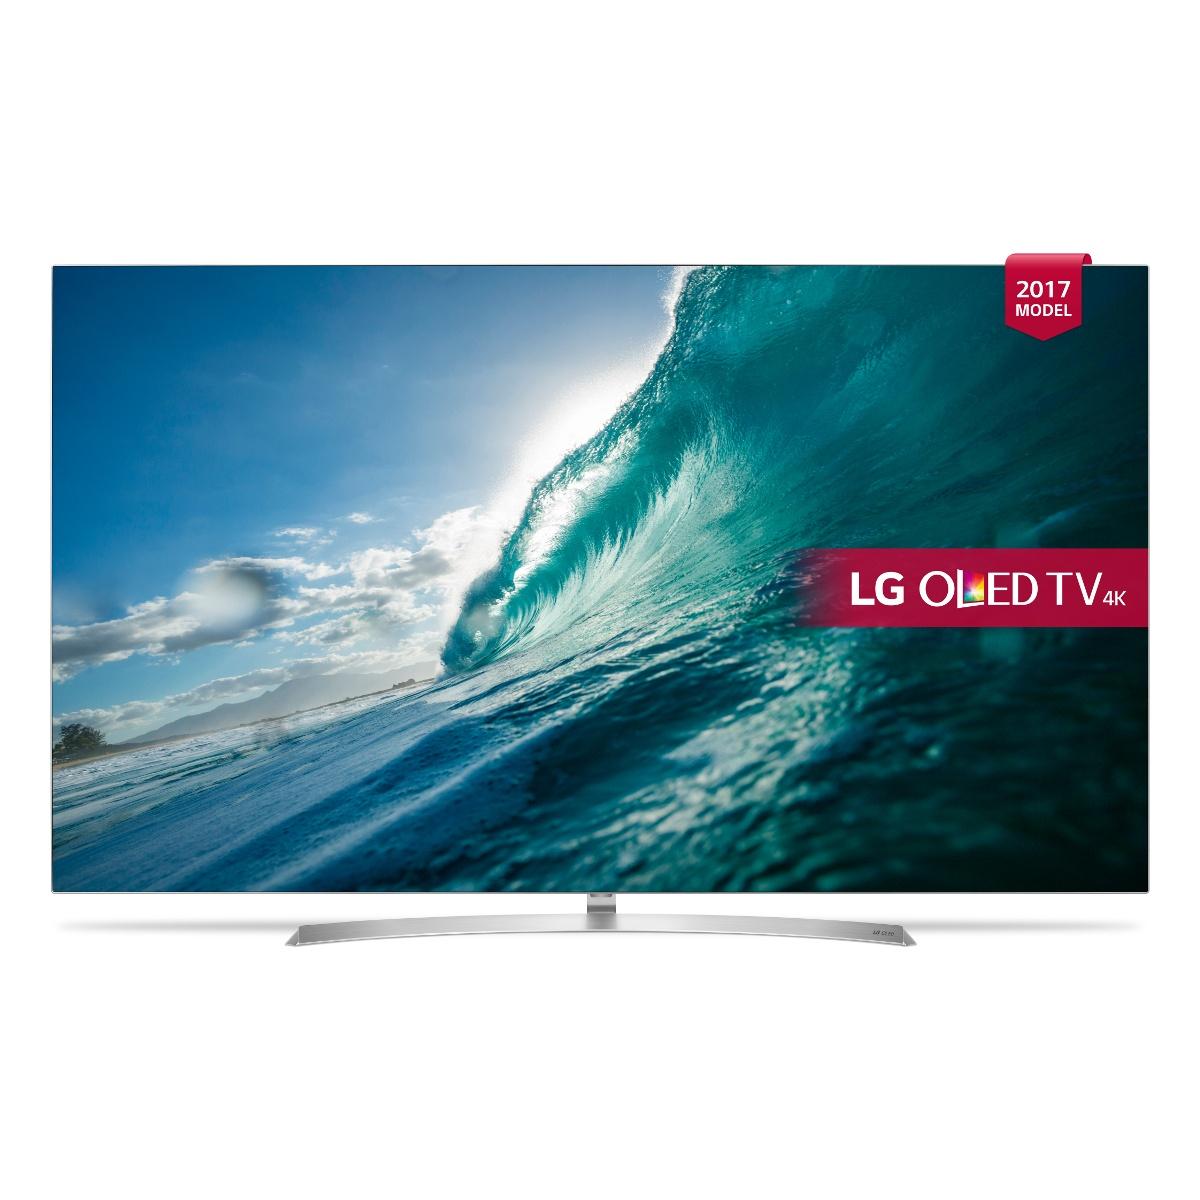 "LG OLED B7 OLED65B7V 65"" Premium 4K Ultra HDR Smart OLED TV £1879 @ Hughes"